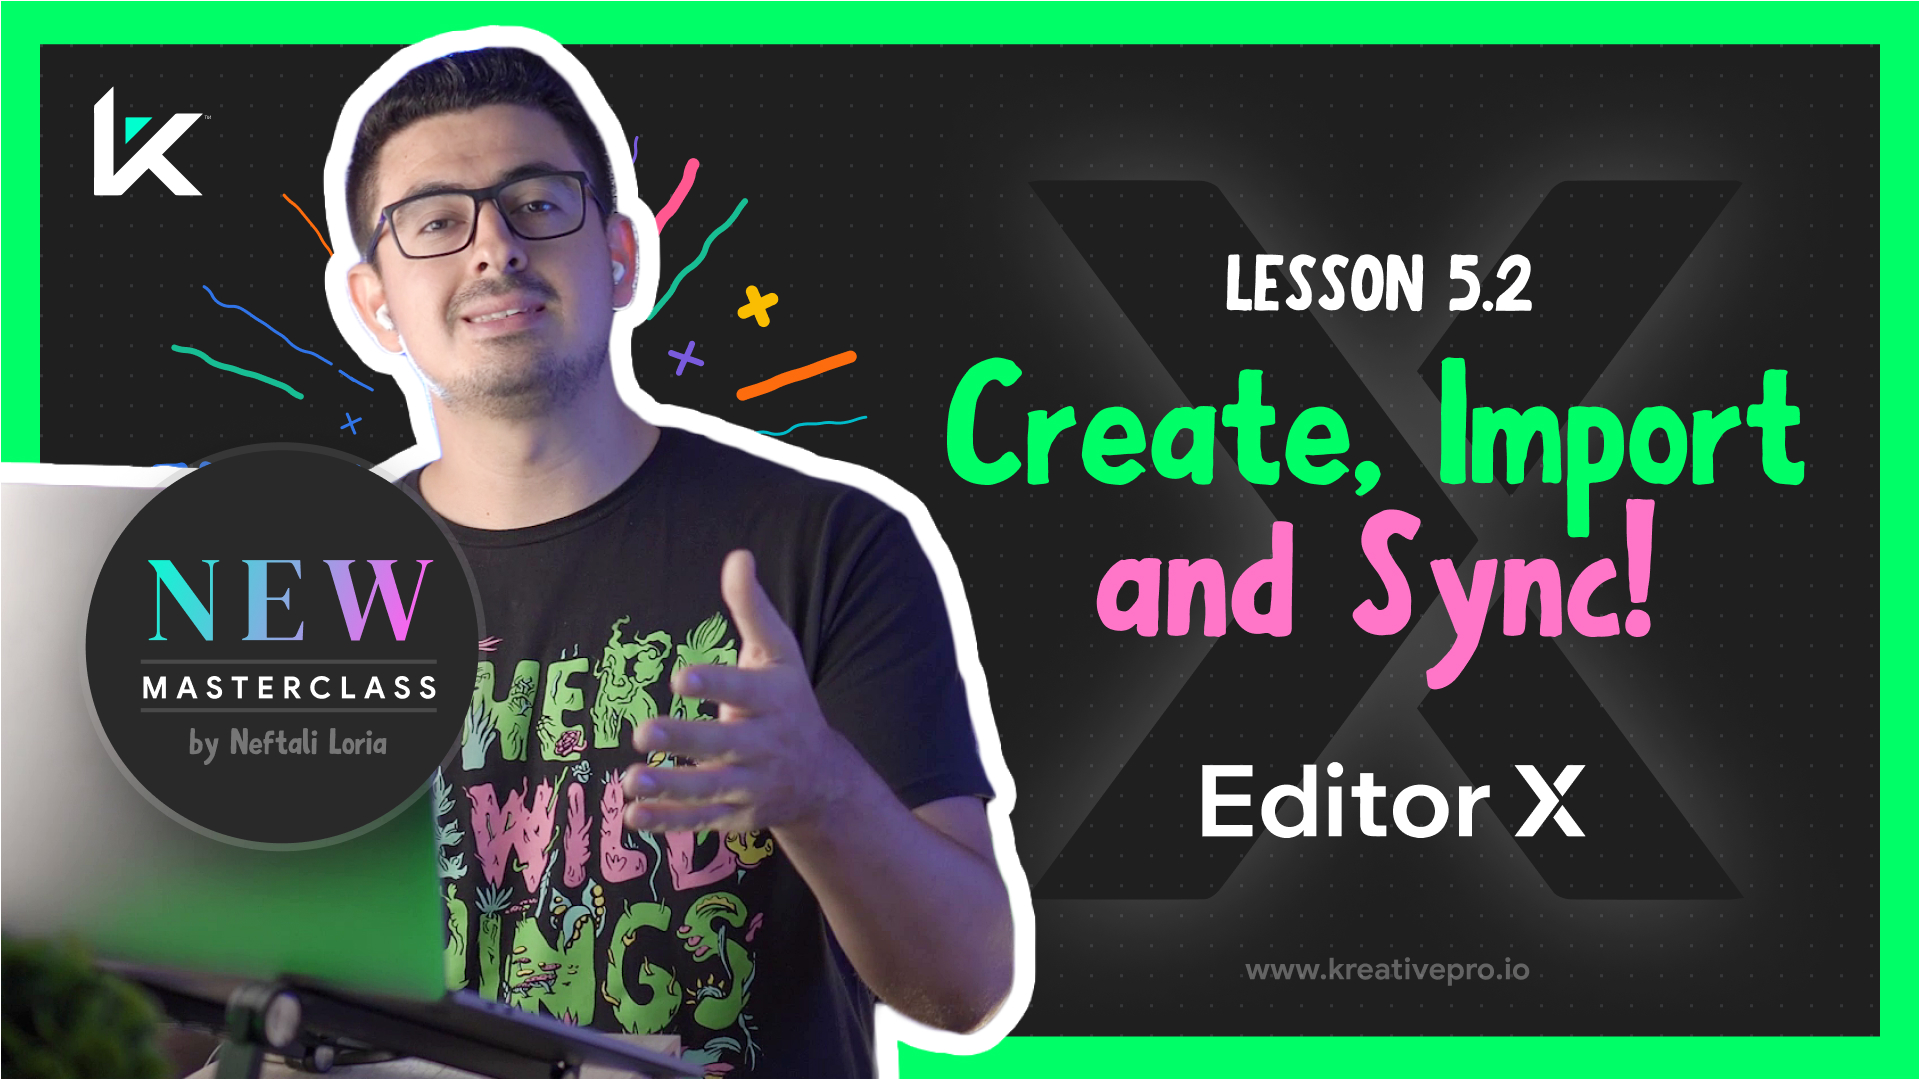 Editor X 5.2 - Create and Sync Data